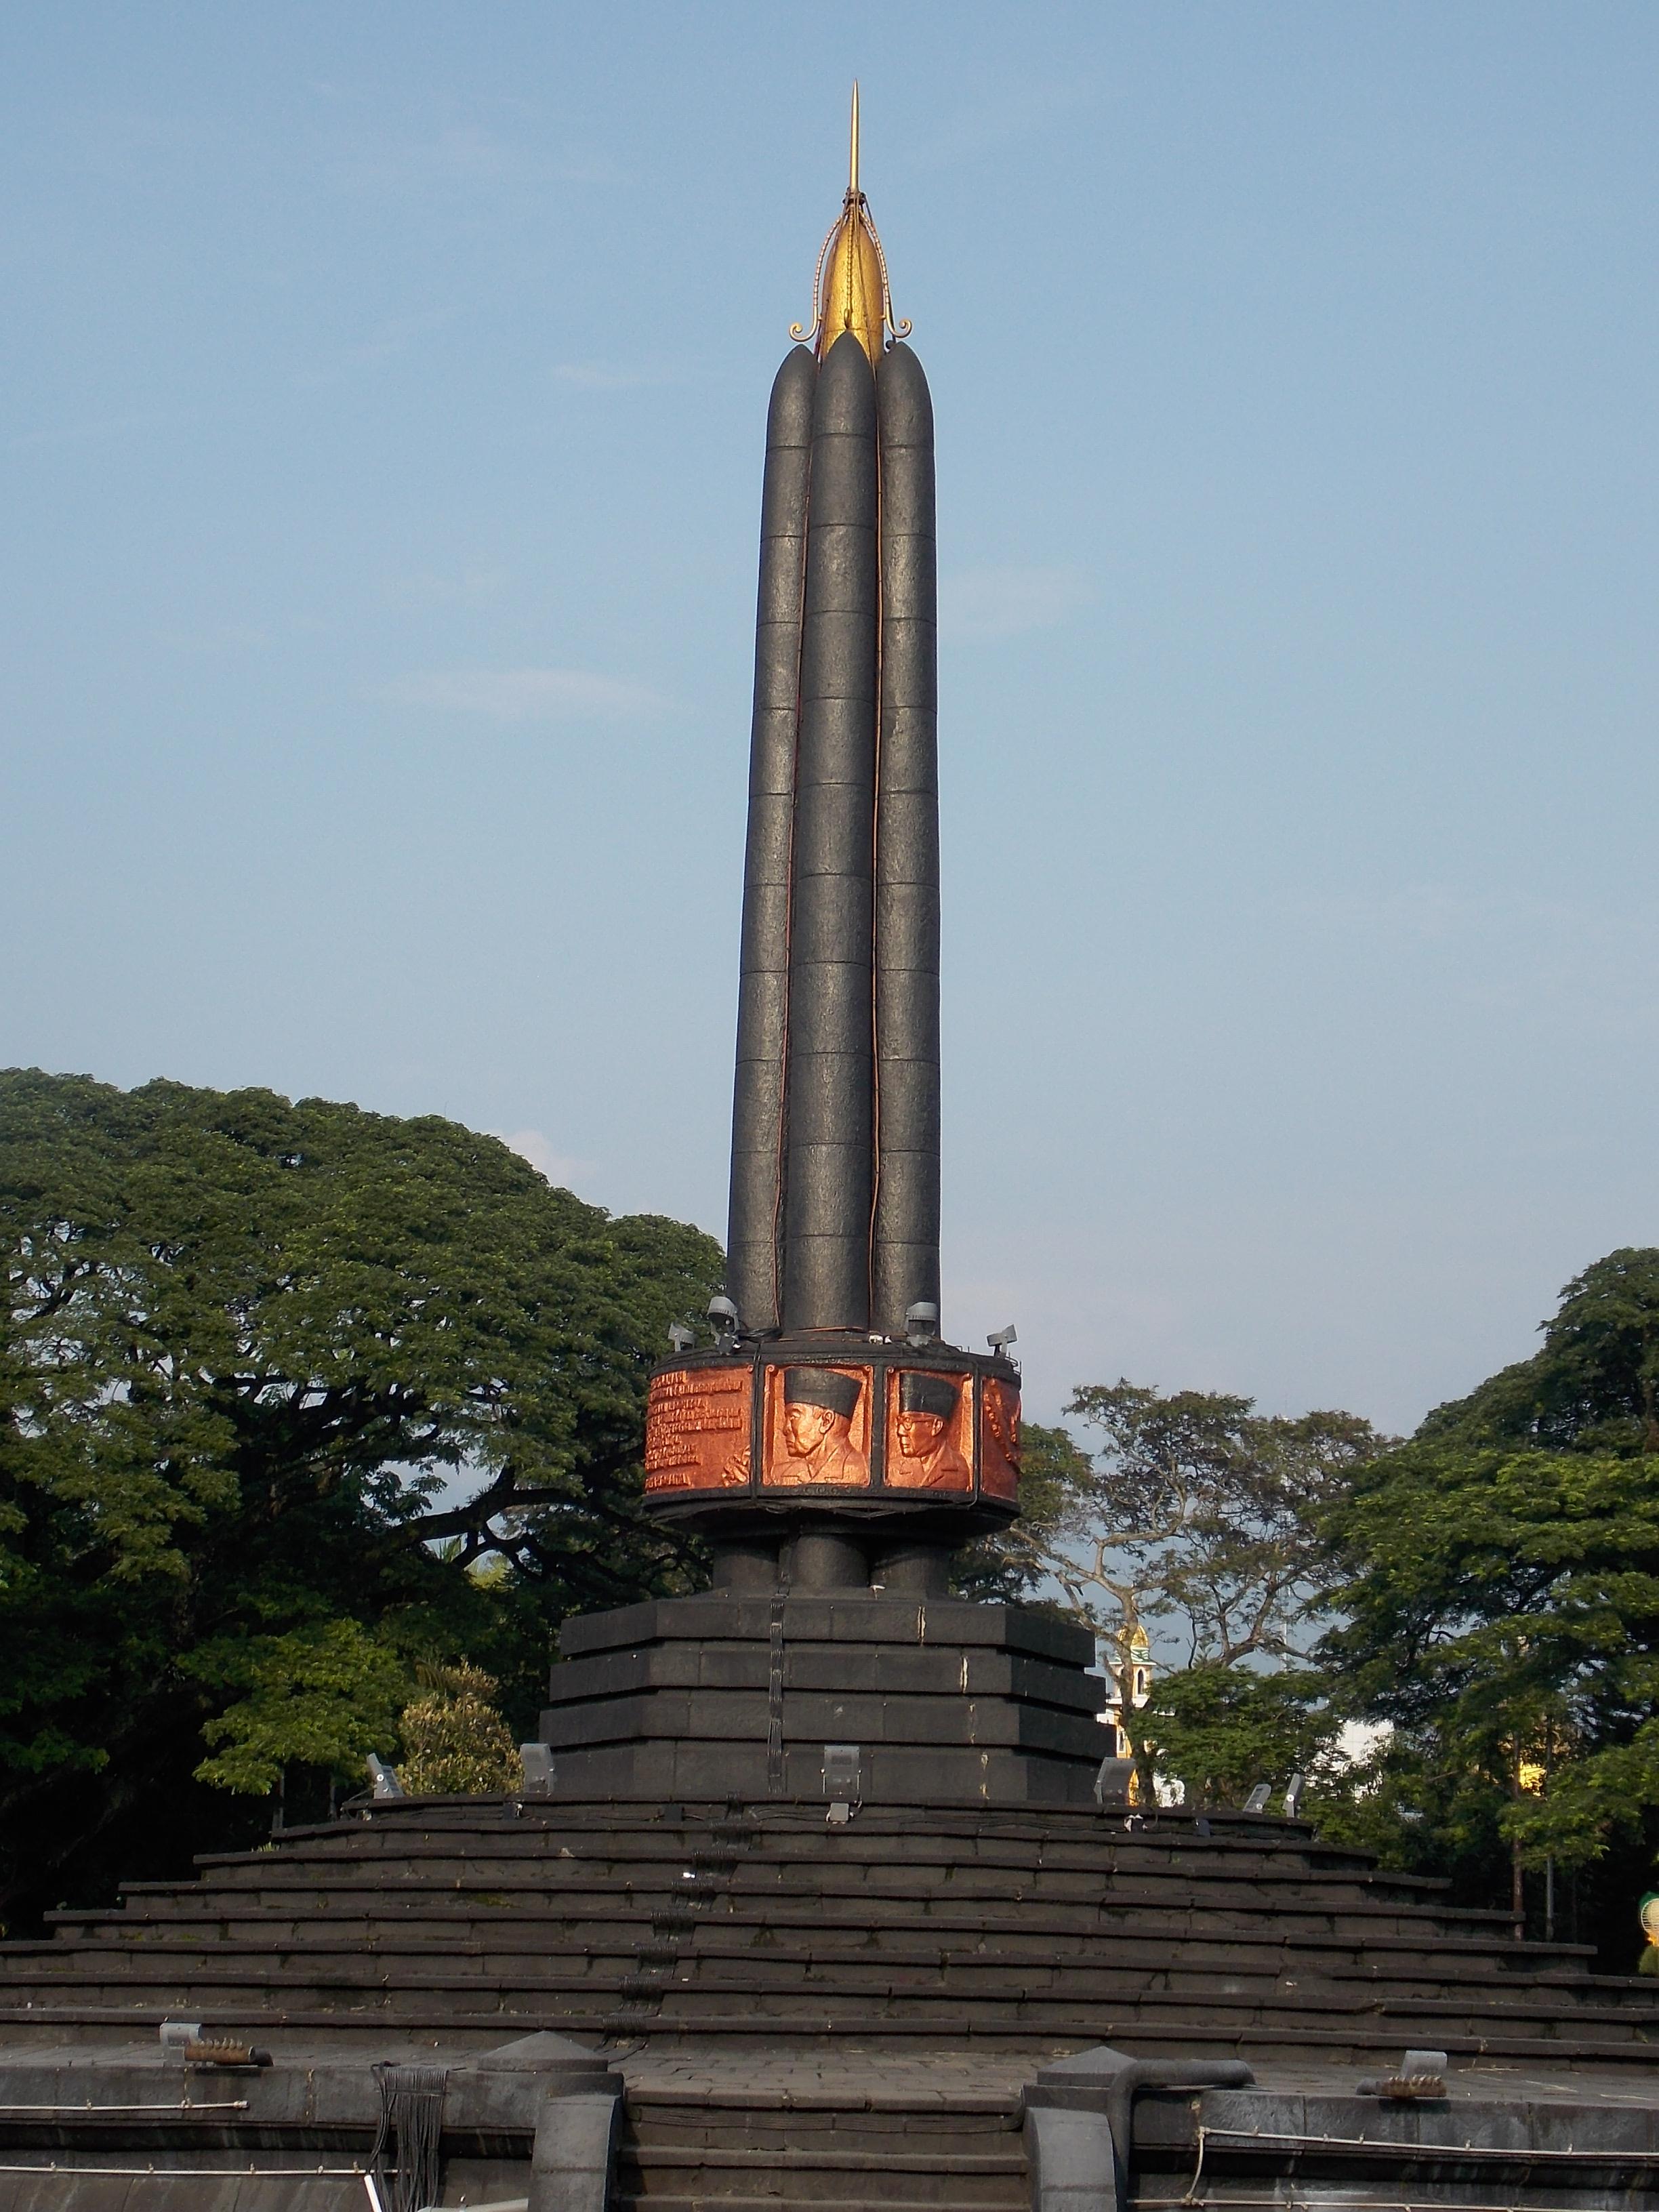 Tugu Malang Png : malang, Kunjungan, Wisata, Malang, Another, About